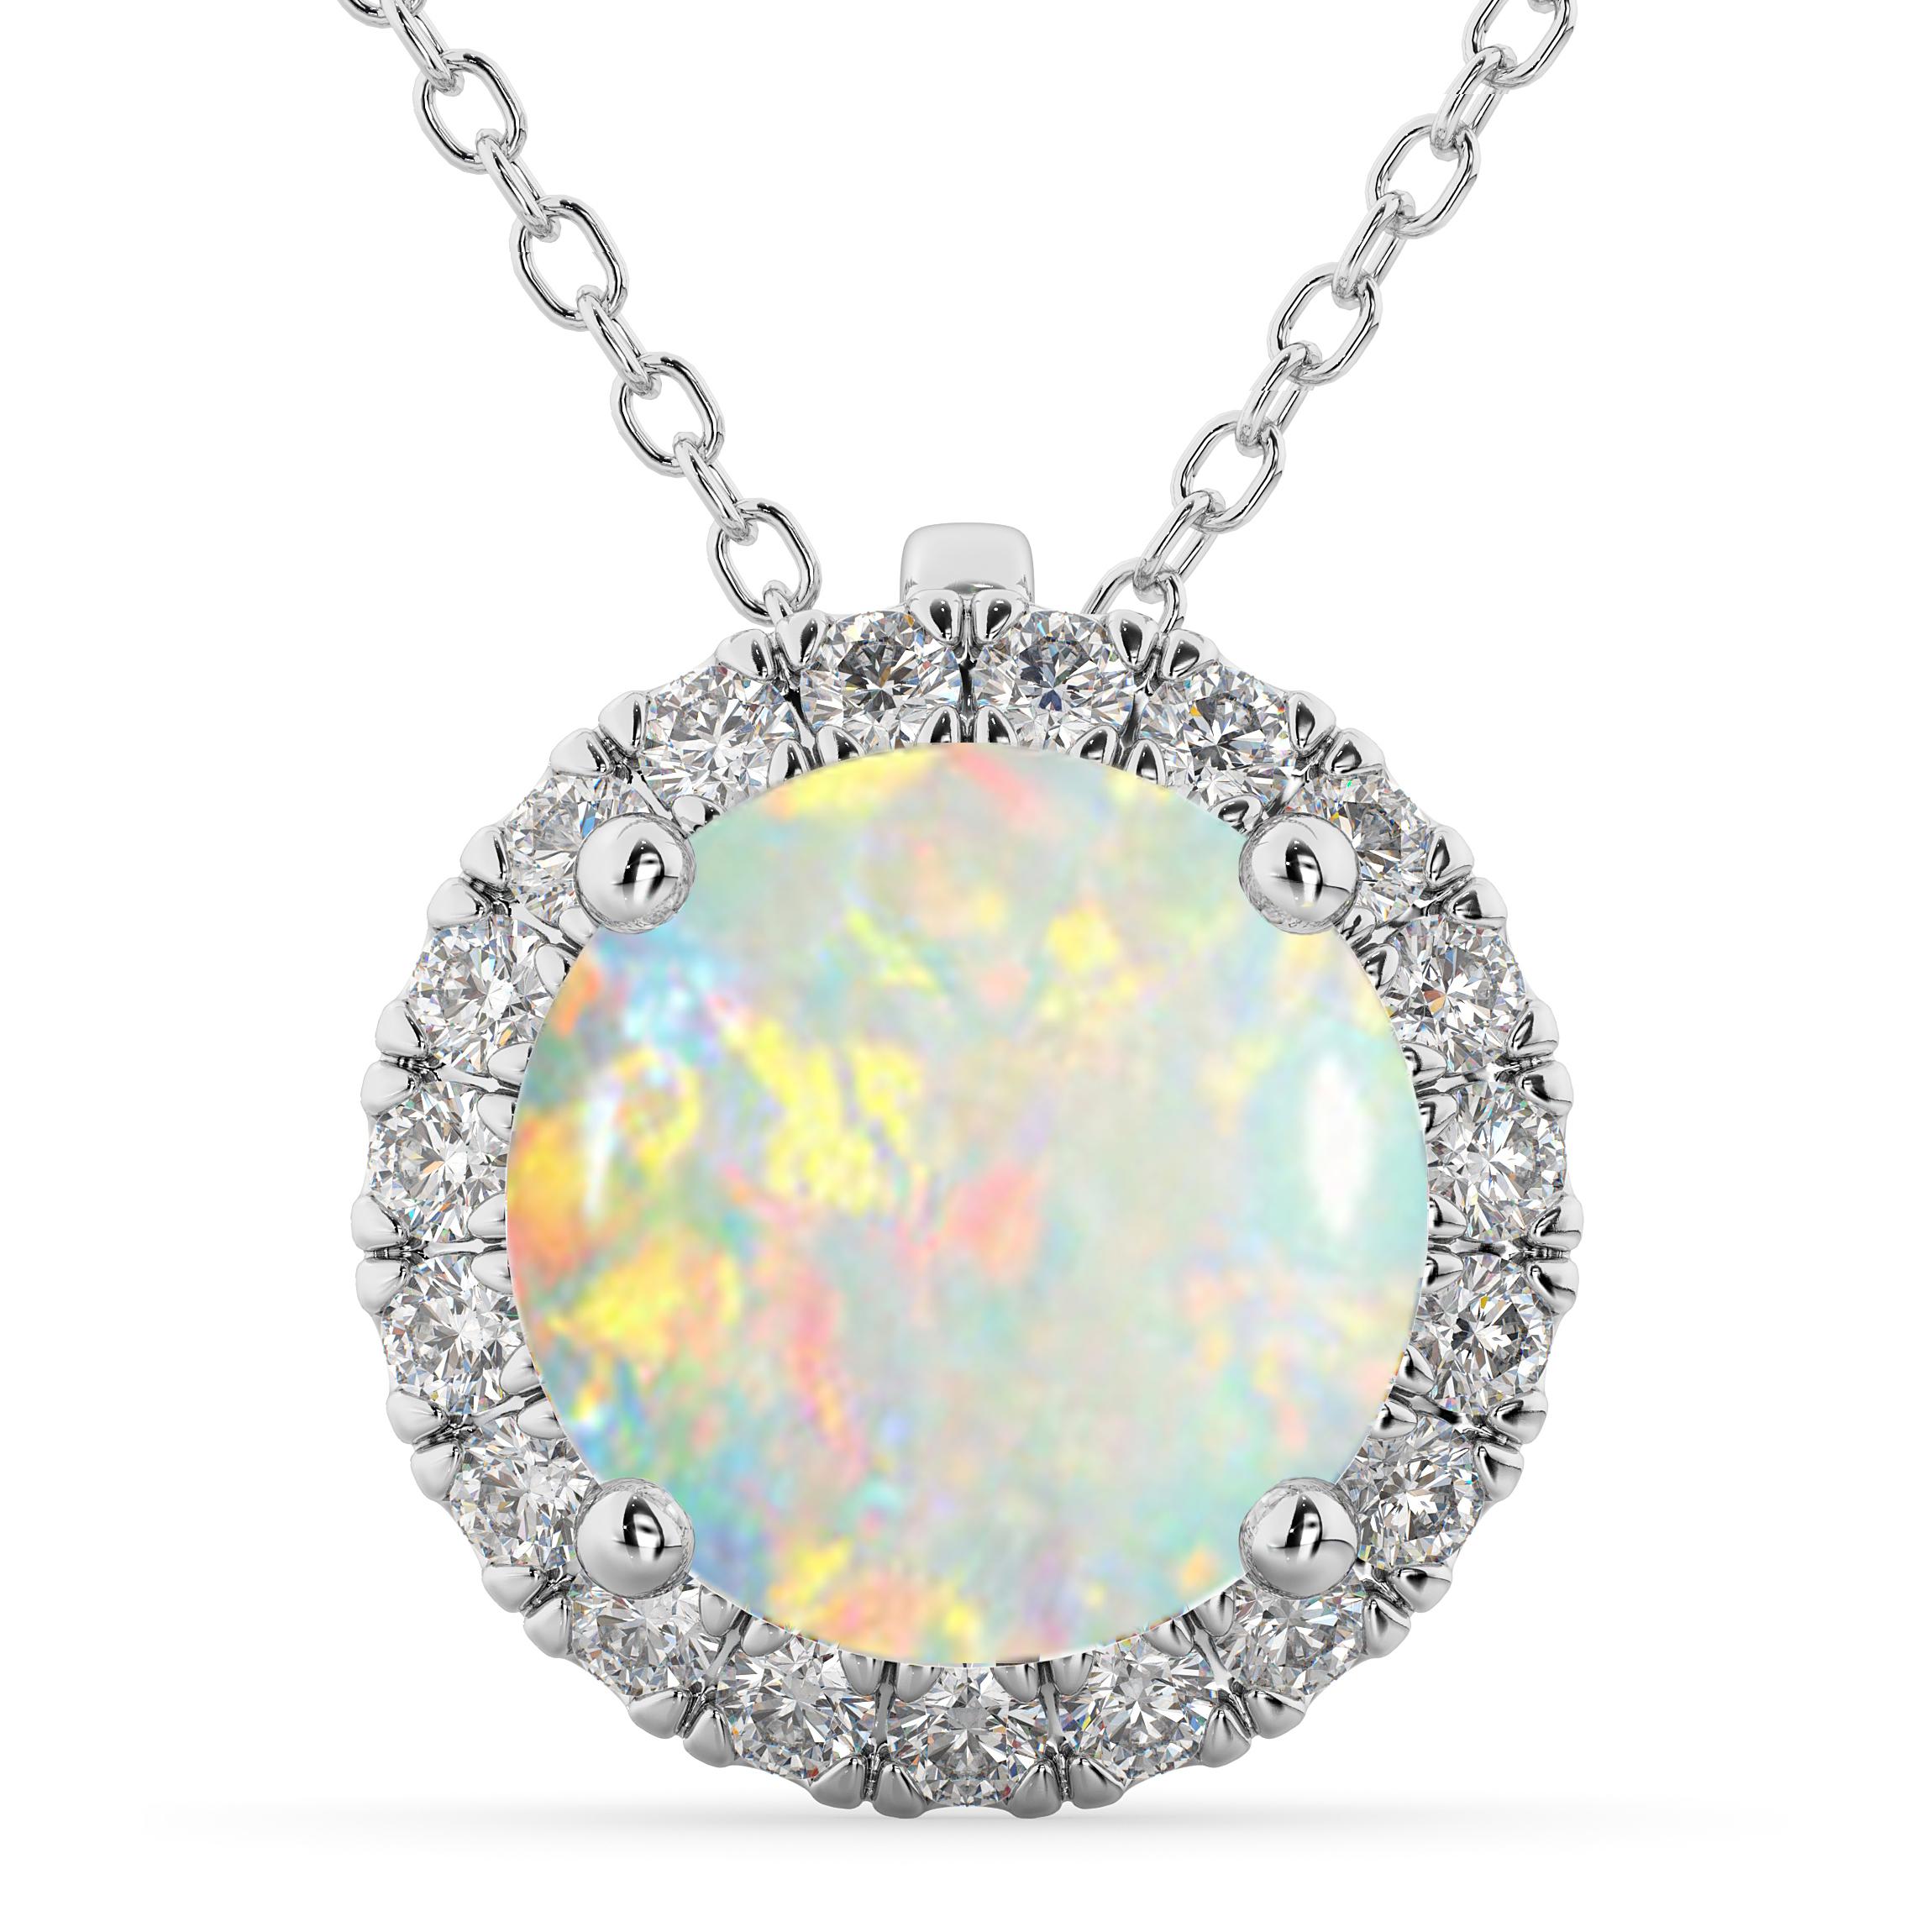 Halo Round Opal & Diamond Pendant Necklace 14k White Gold (2.09ct)